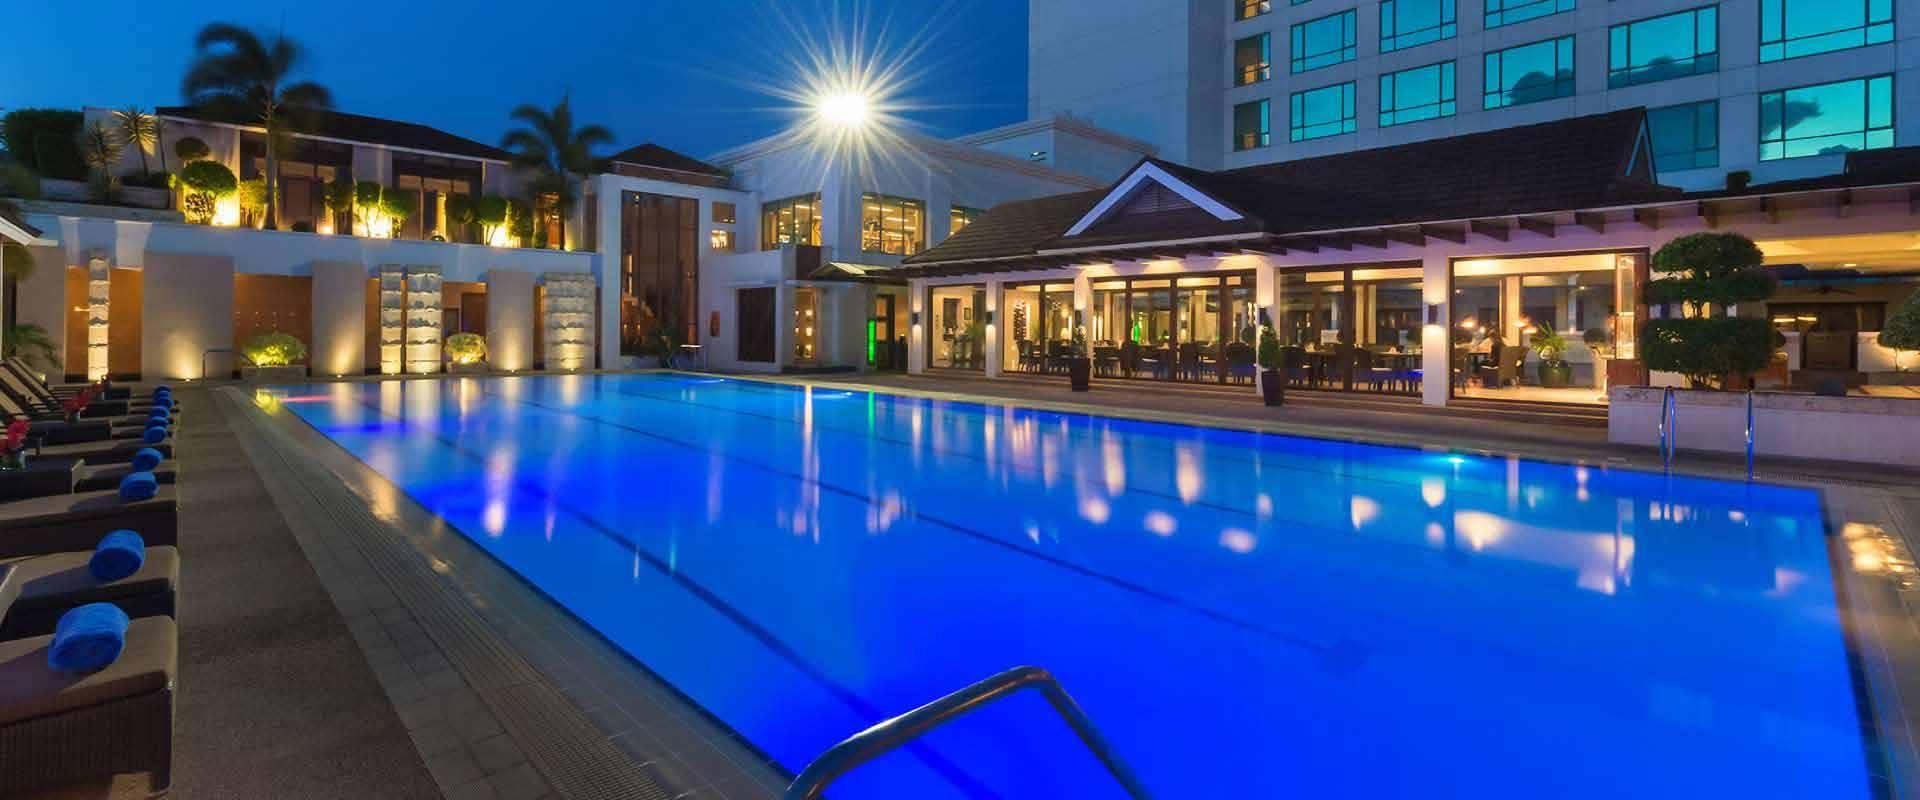 Swimming Pool Hotels : Minadanao davao hotel swimming pool marco polo